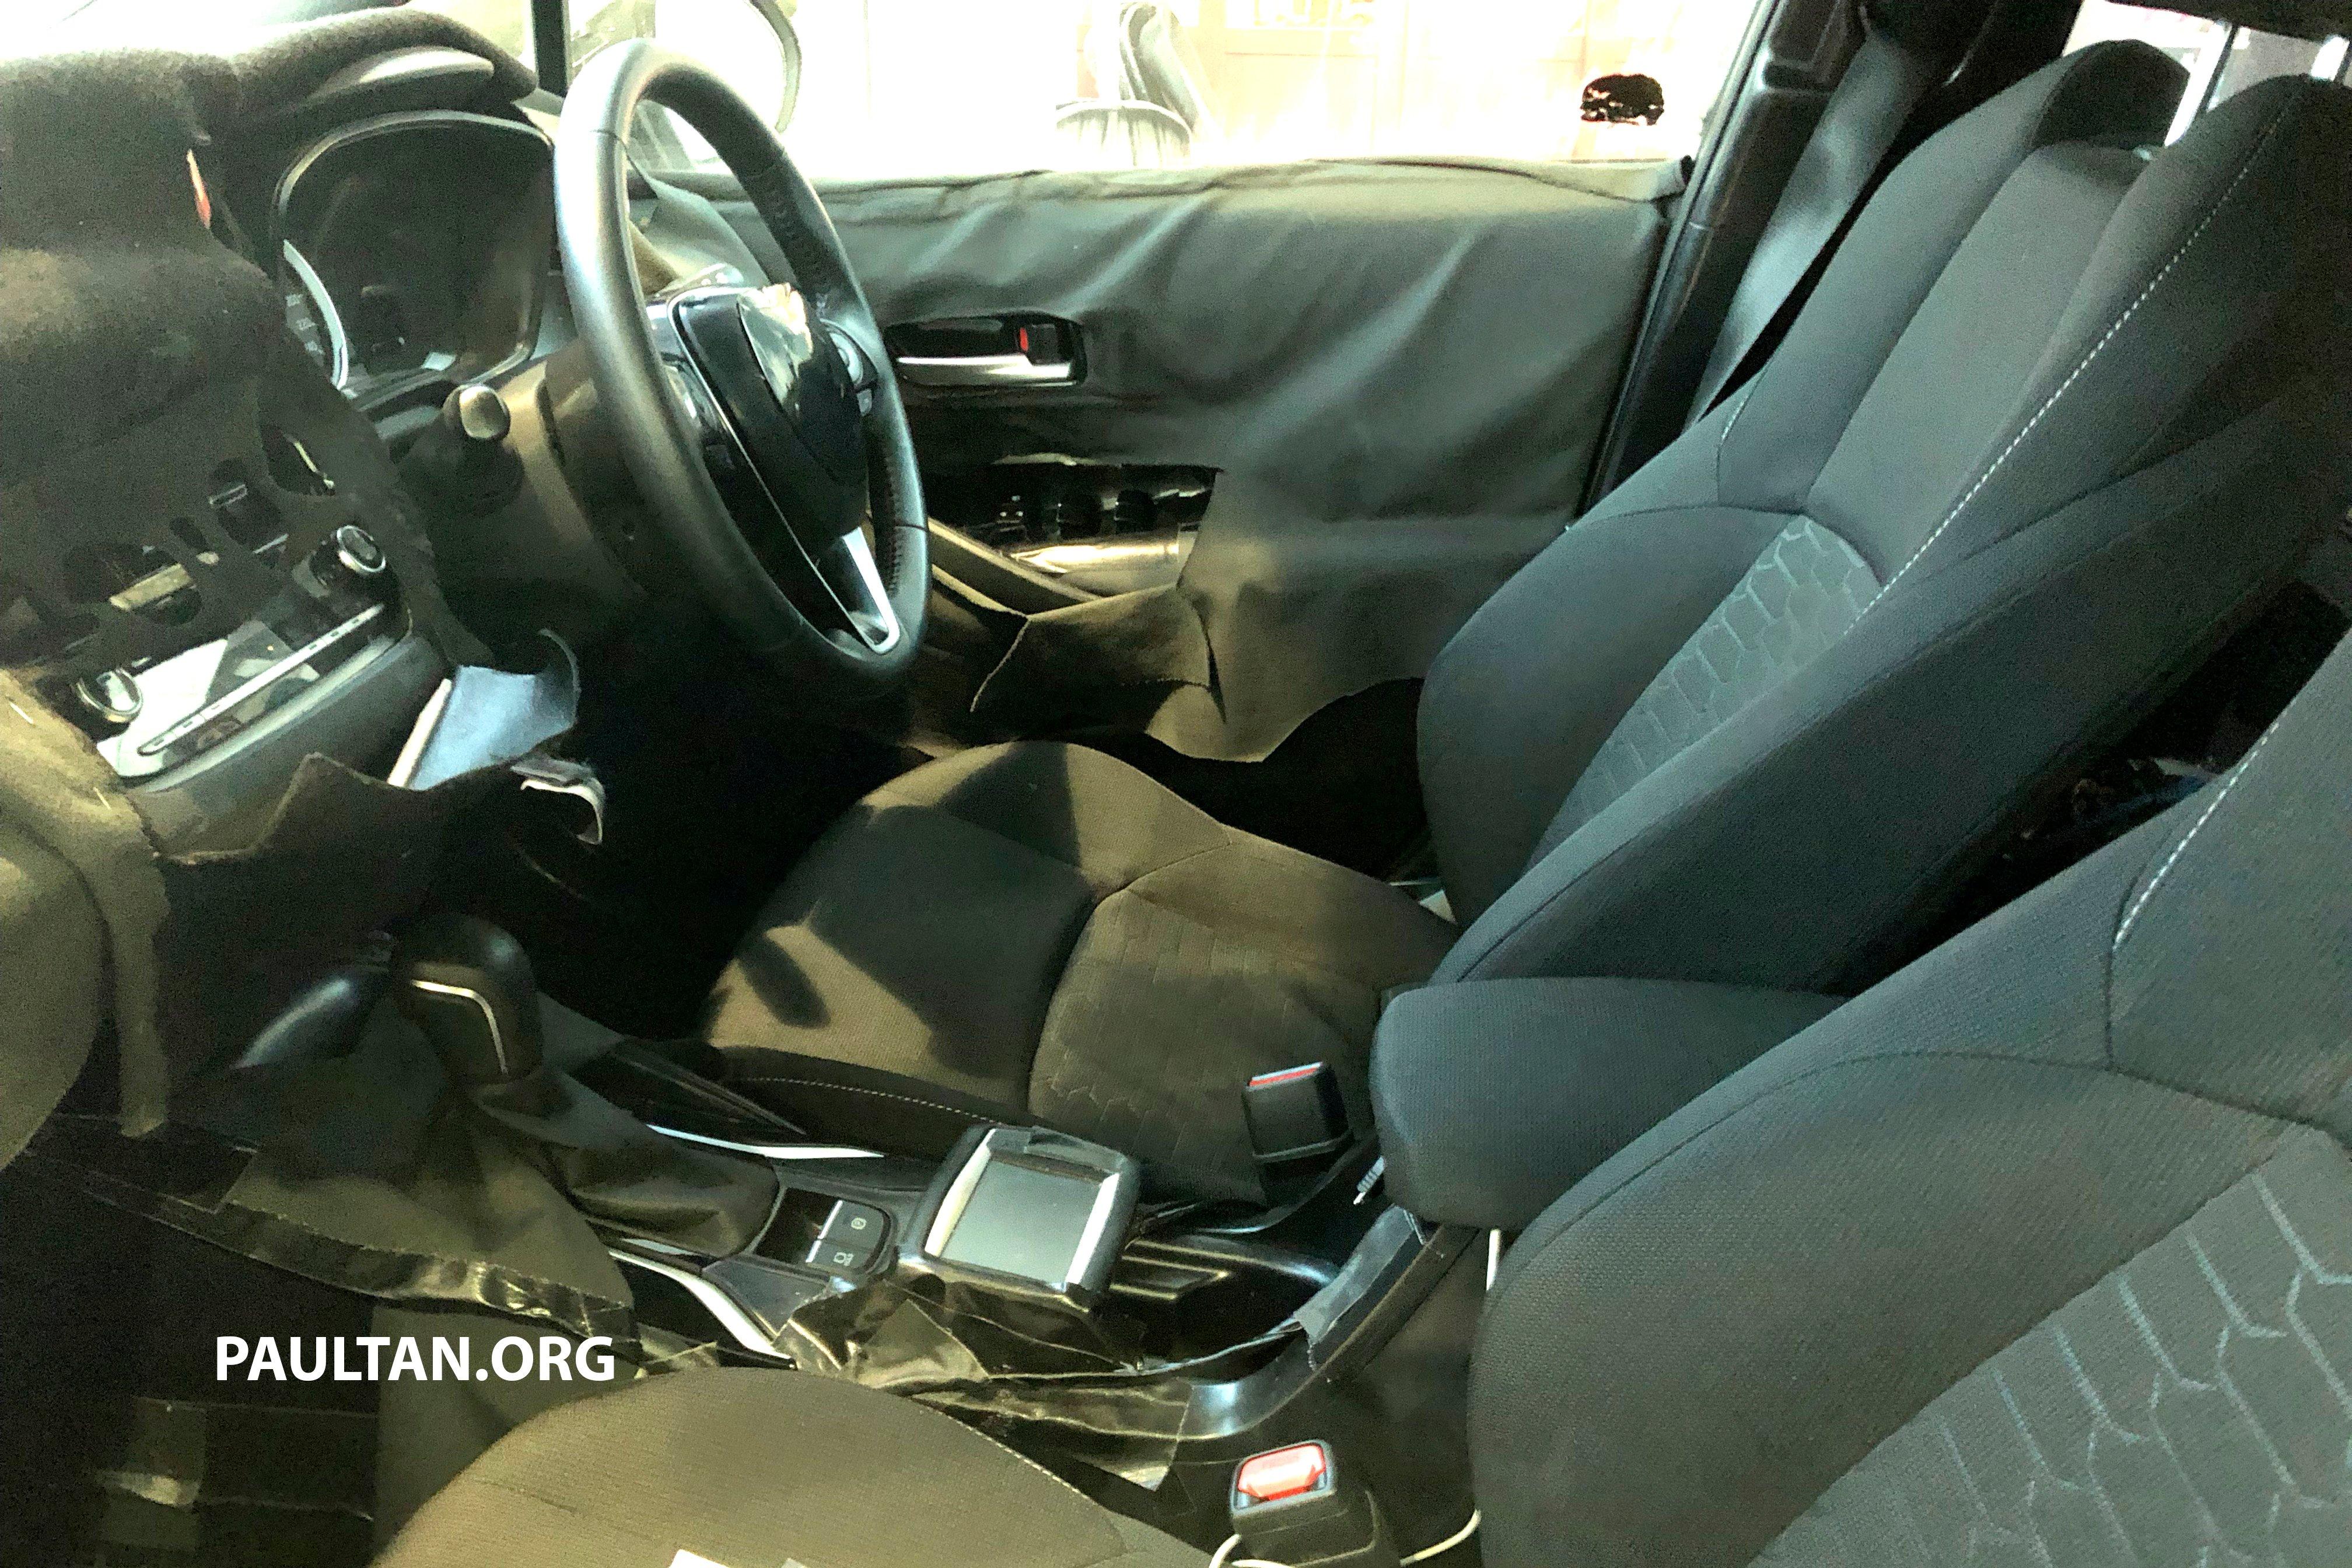 https://paultan.org/image/2018/01/2019-Toyota-Auris-spyshots-22.jpg